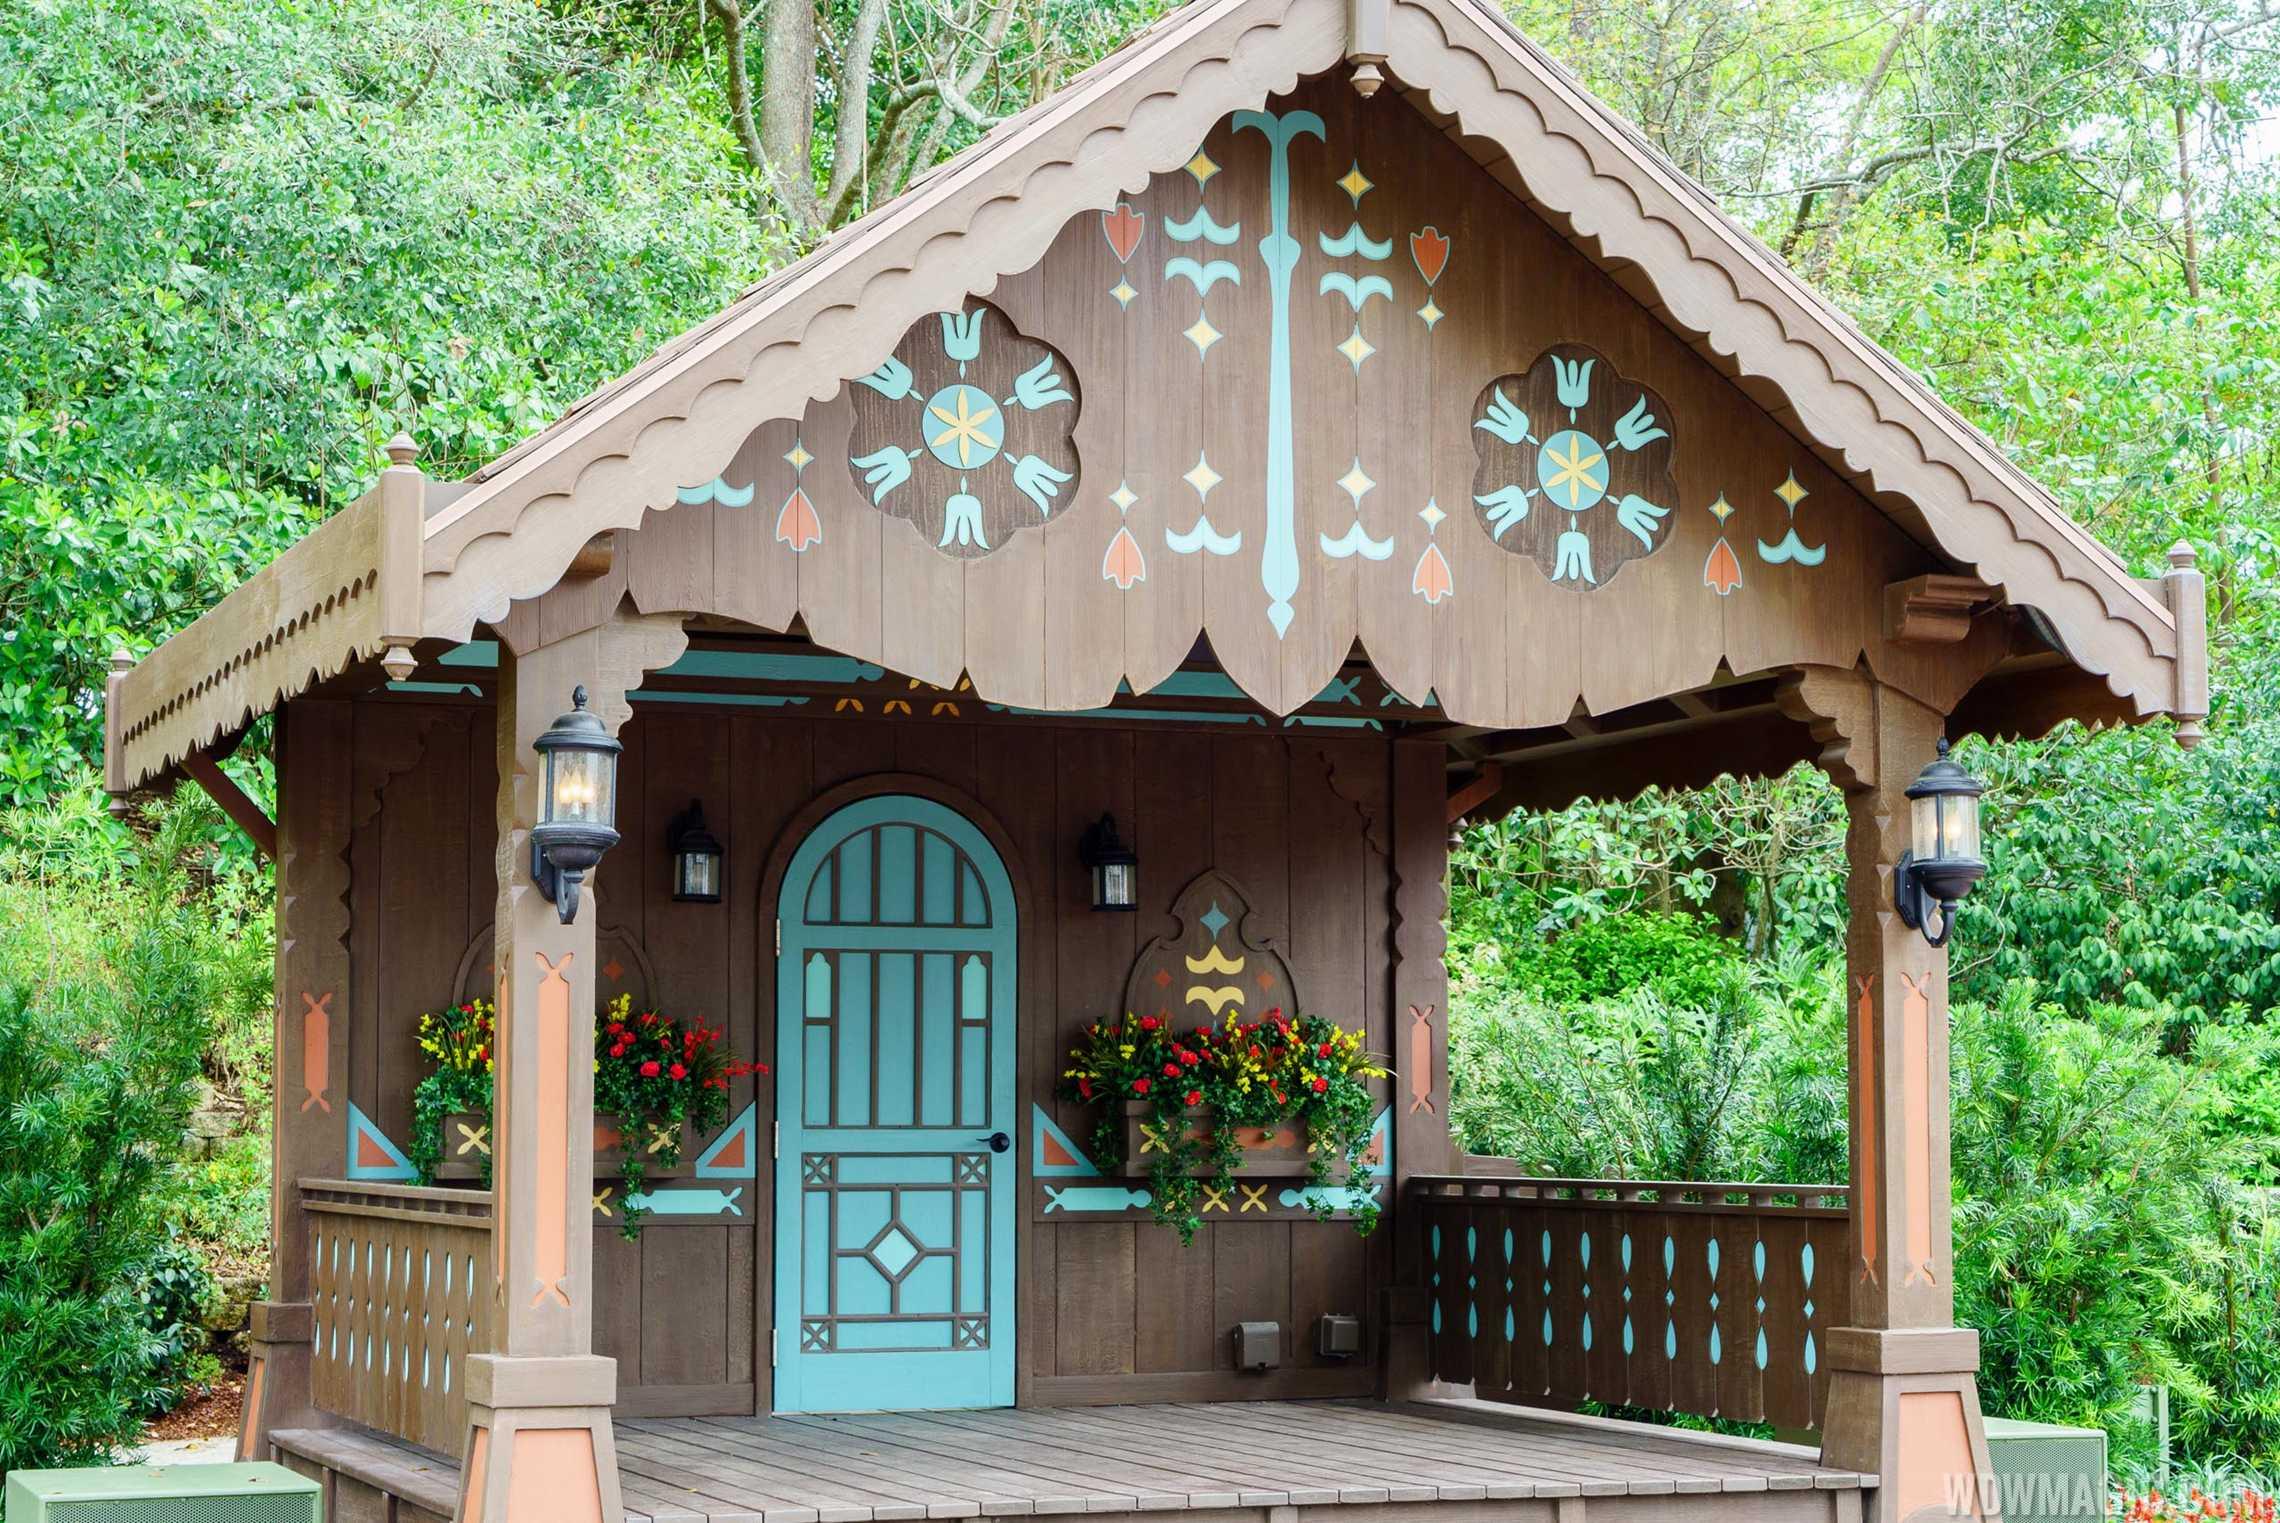 Germany Pavilion stage